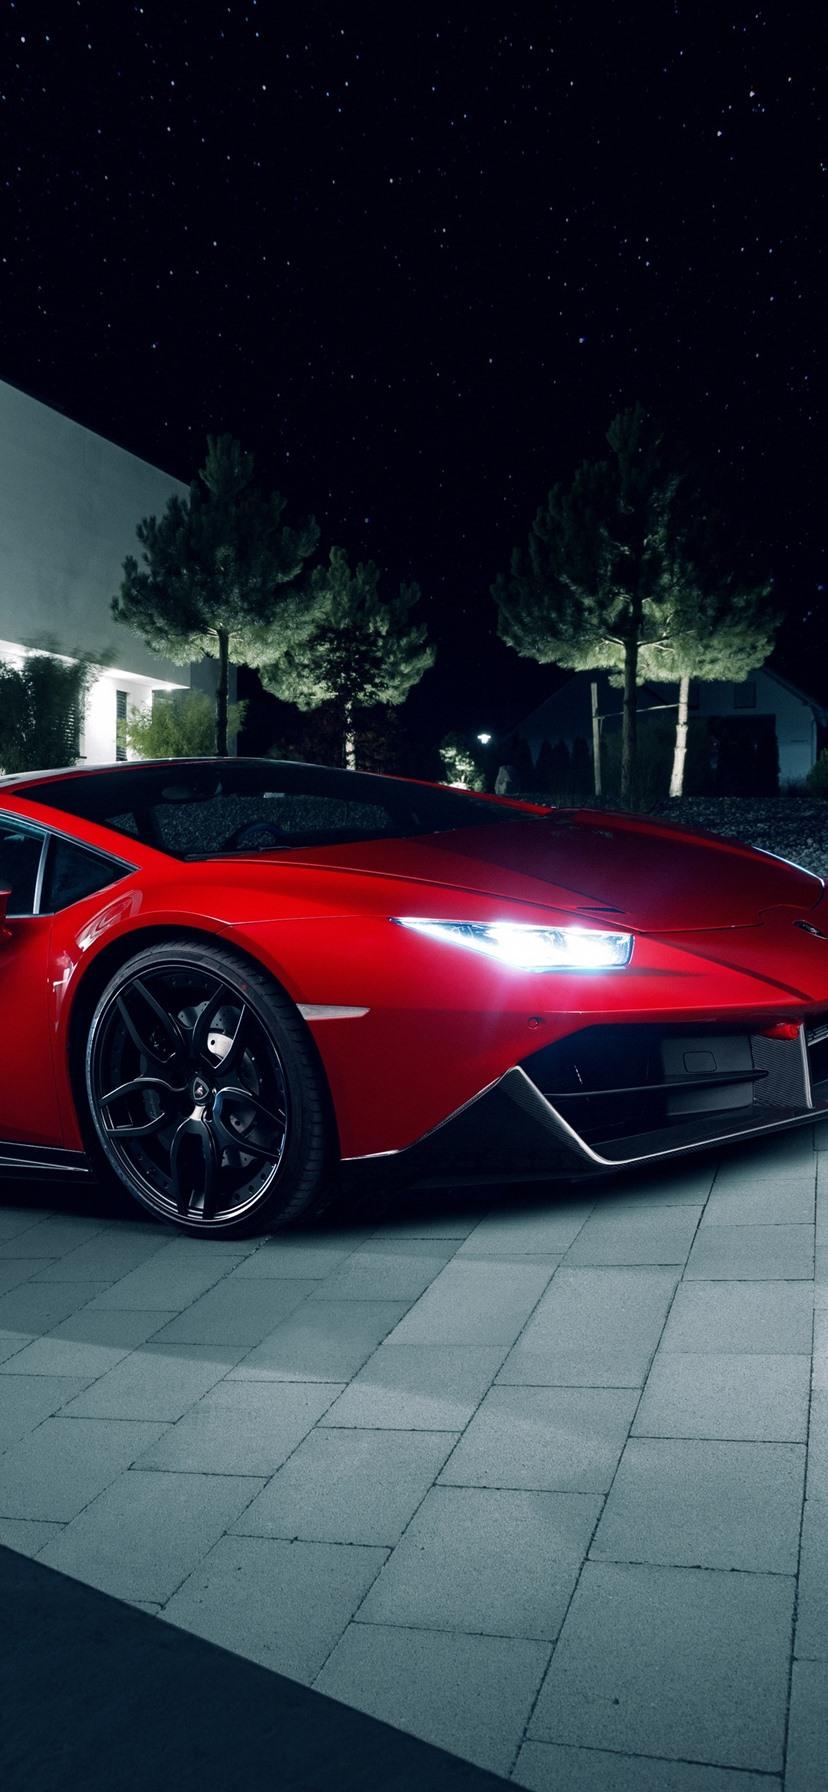 Lamborghini Huracan Red Supercar Night Lights 1242x2688 Iphone Xs